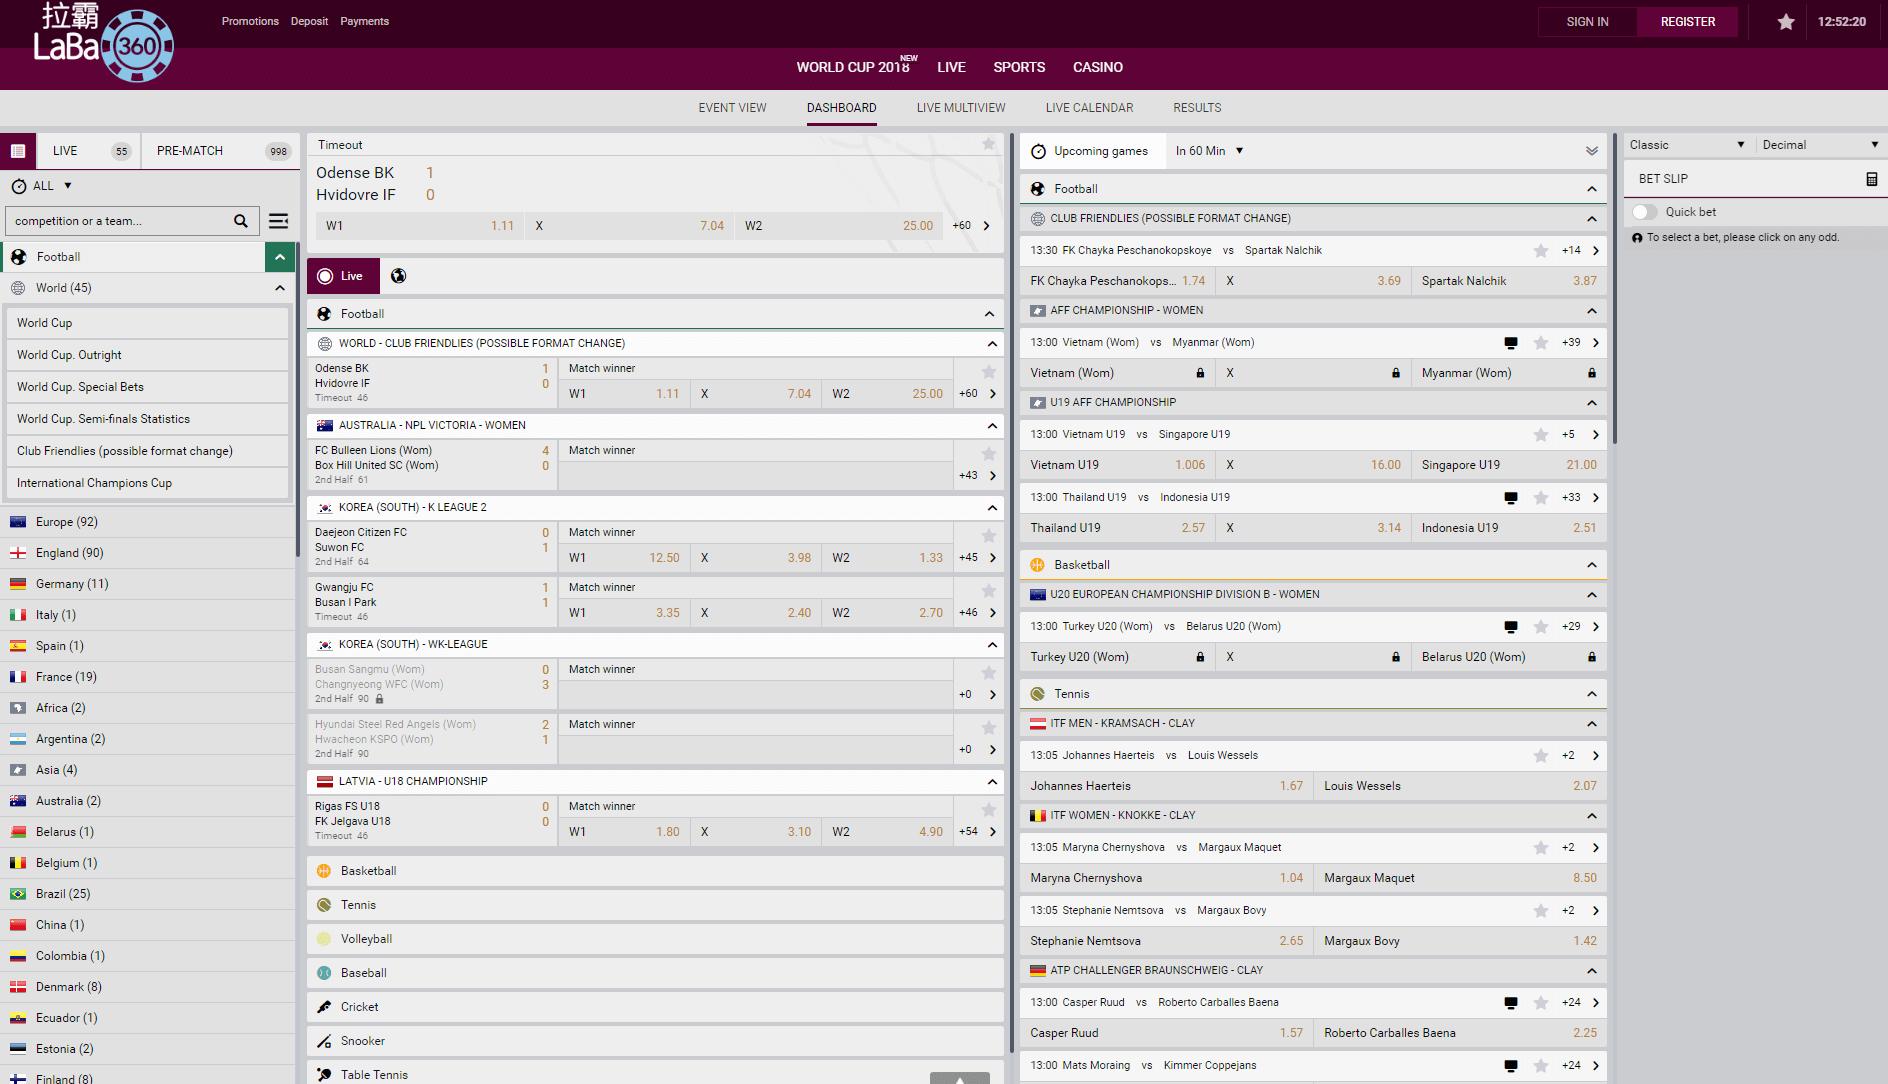 laba360 free bet